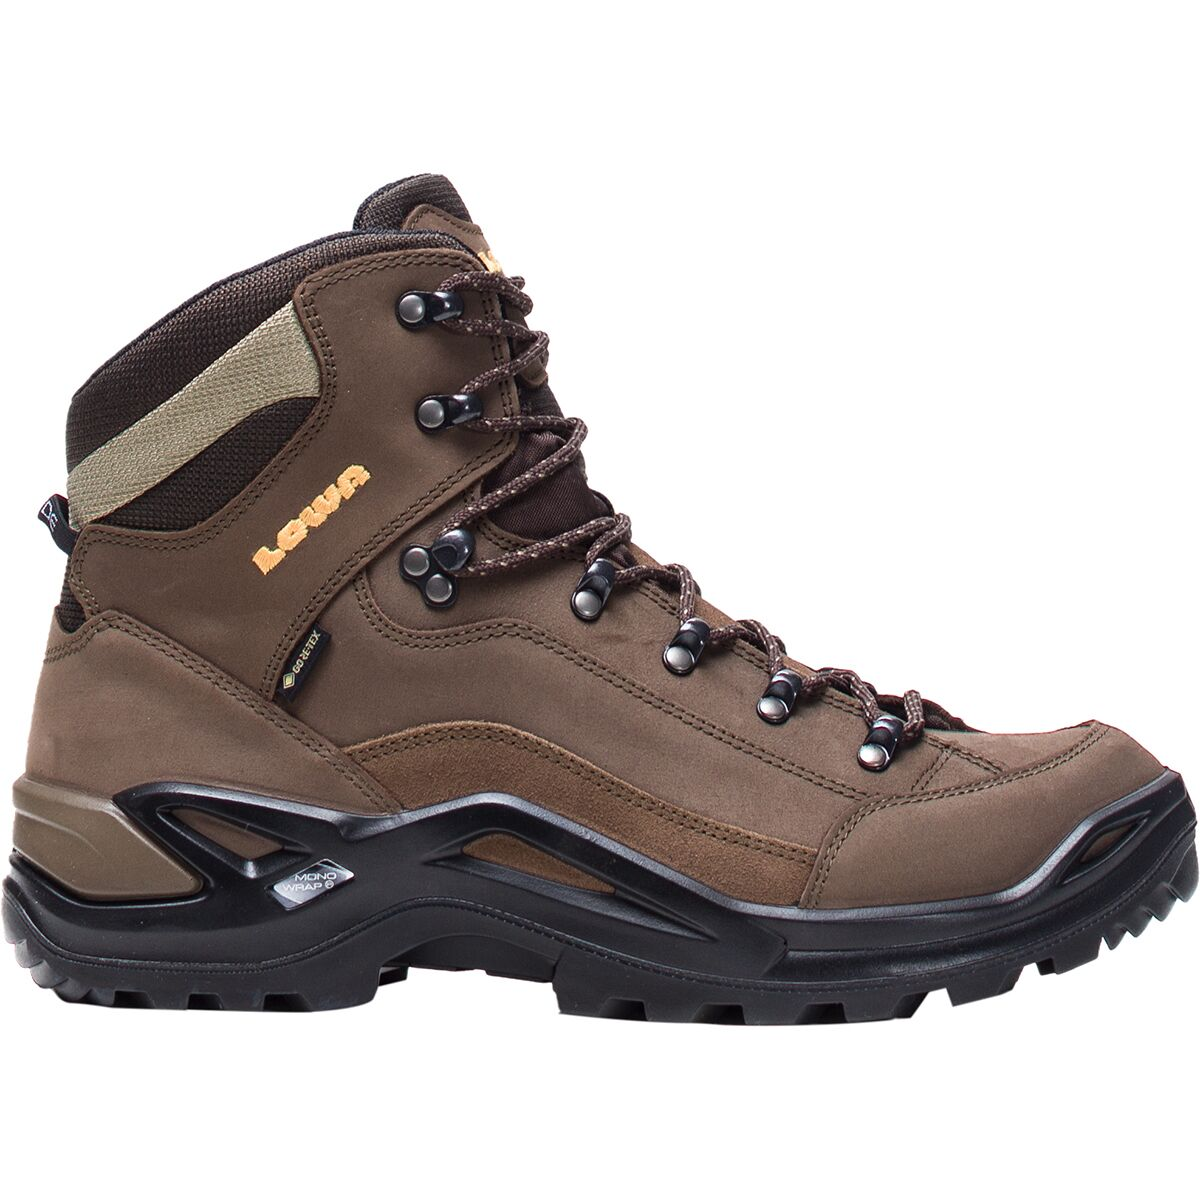 Lowa Renegade Gore-Tex Lo Black Mens Waterproof Outdoor Hiking Shoes